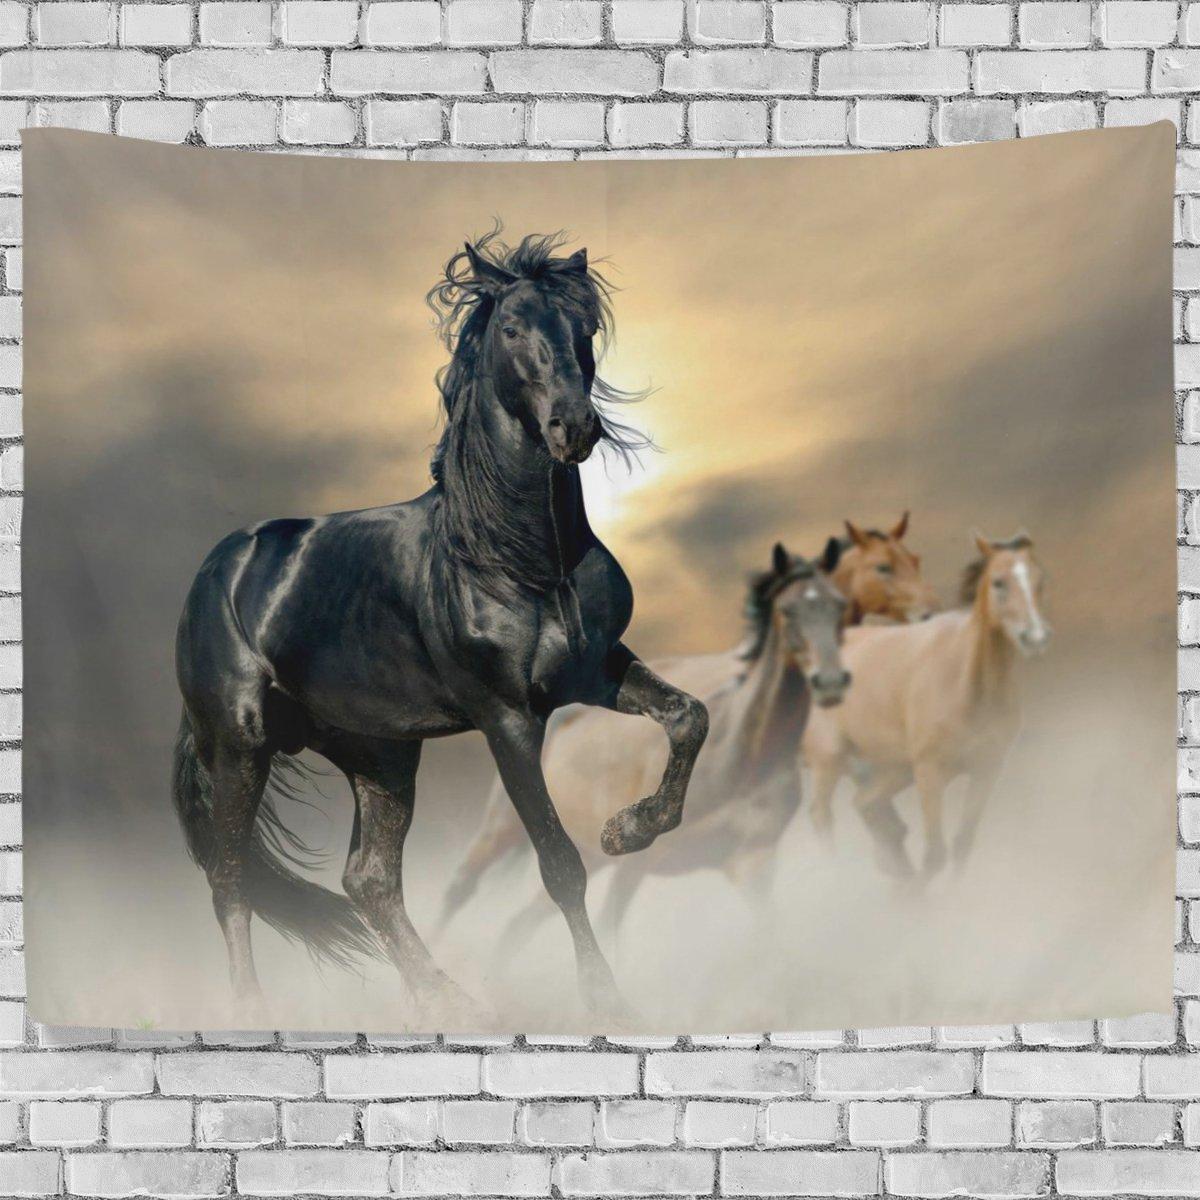 Rabid Horse Artwork Home Facebook - HD1200×1200